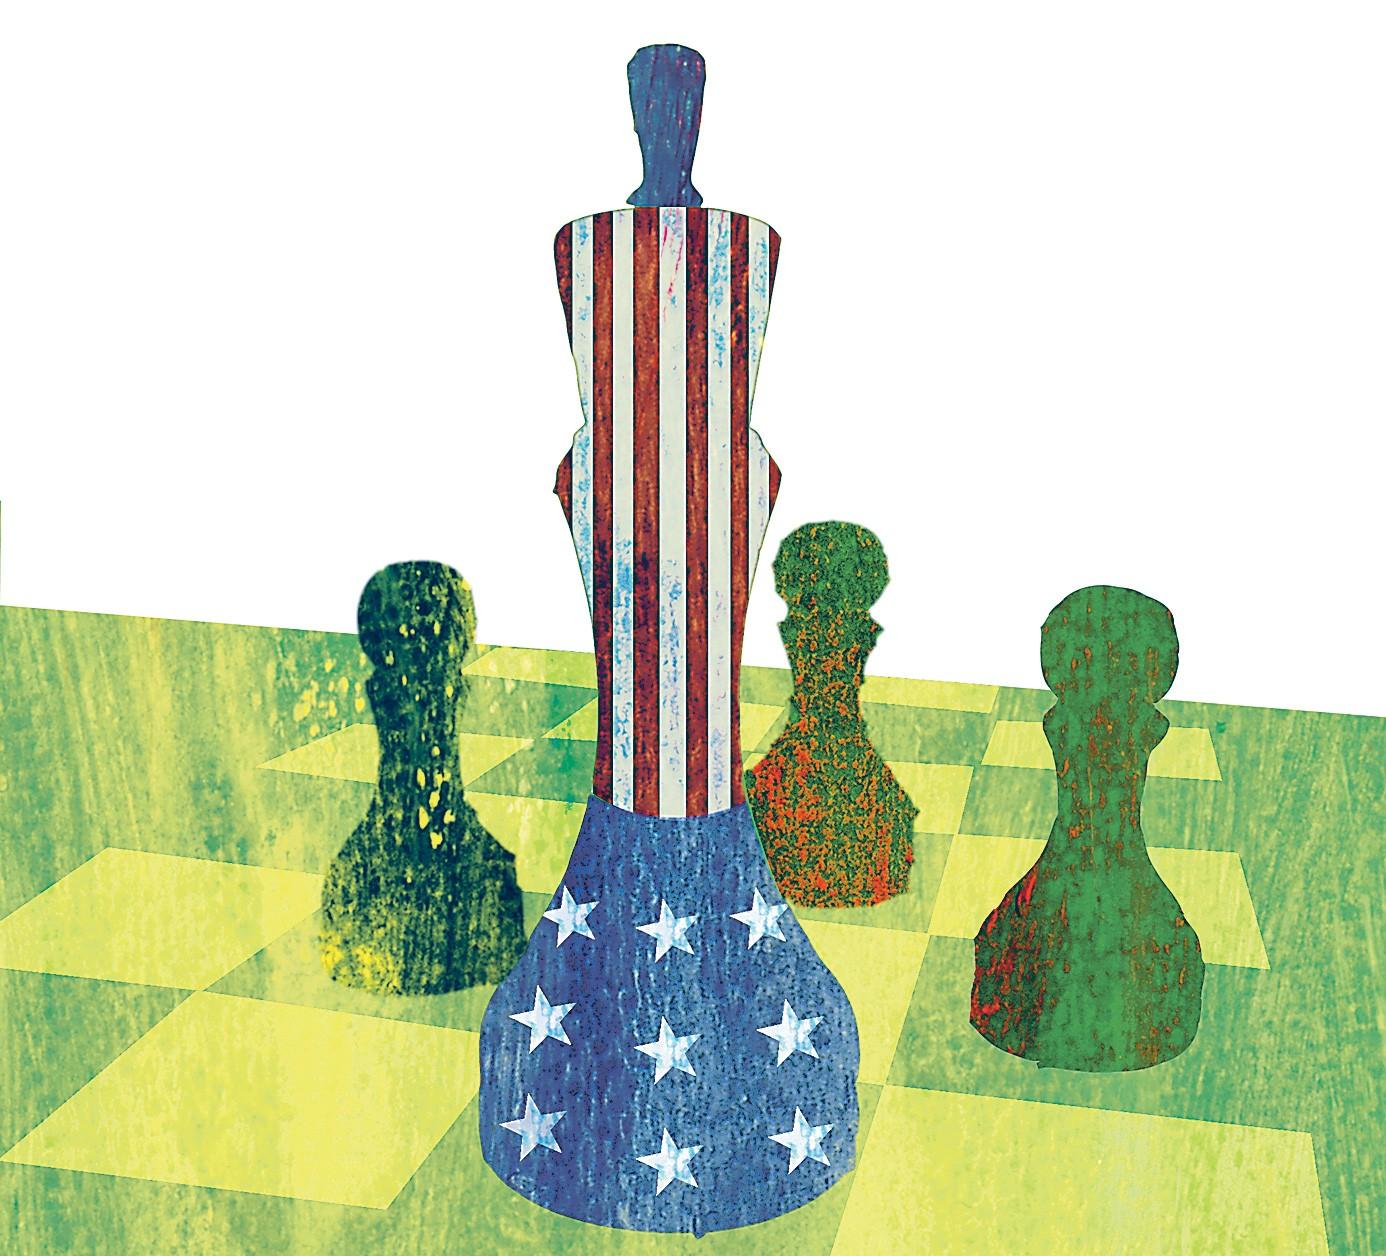 Huomautuksia USA:n ulkopolitiikasta